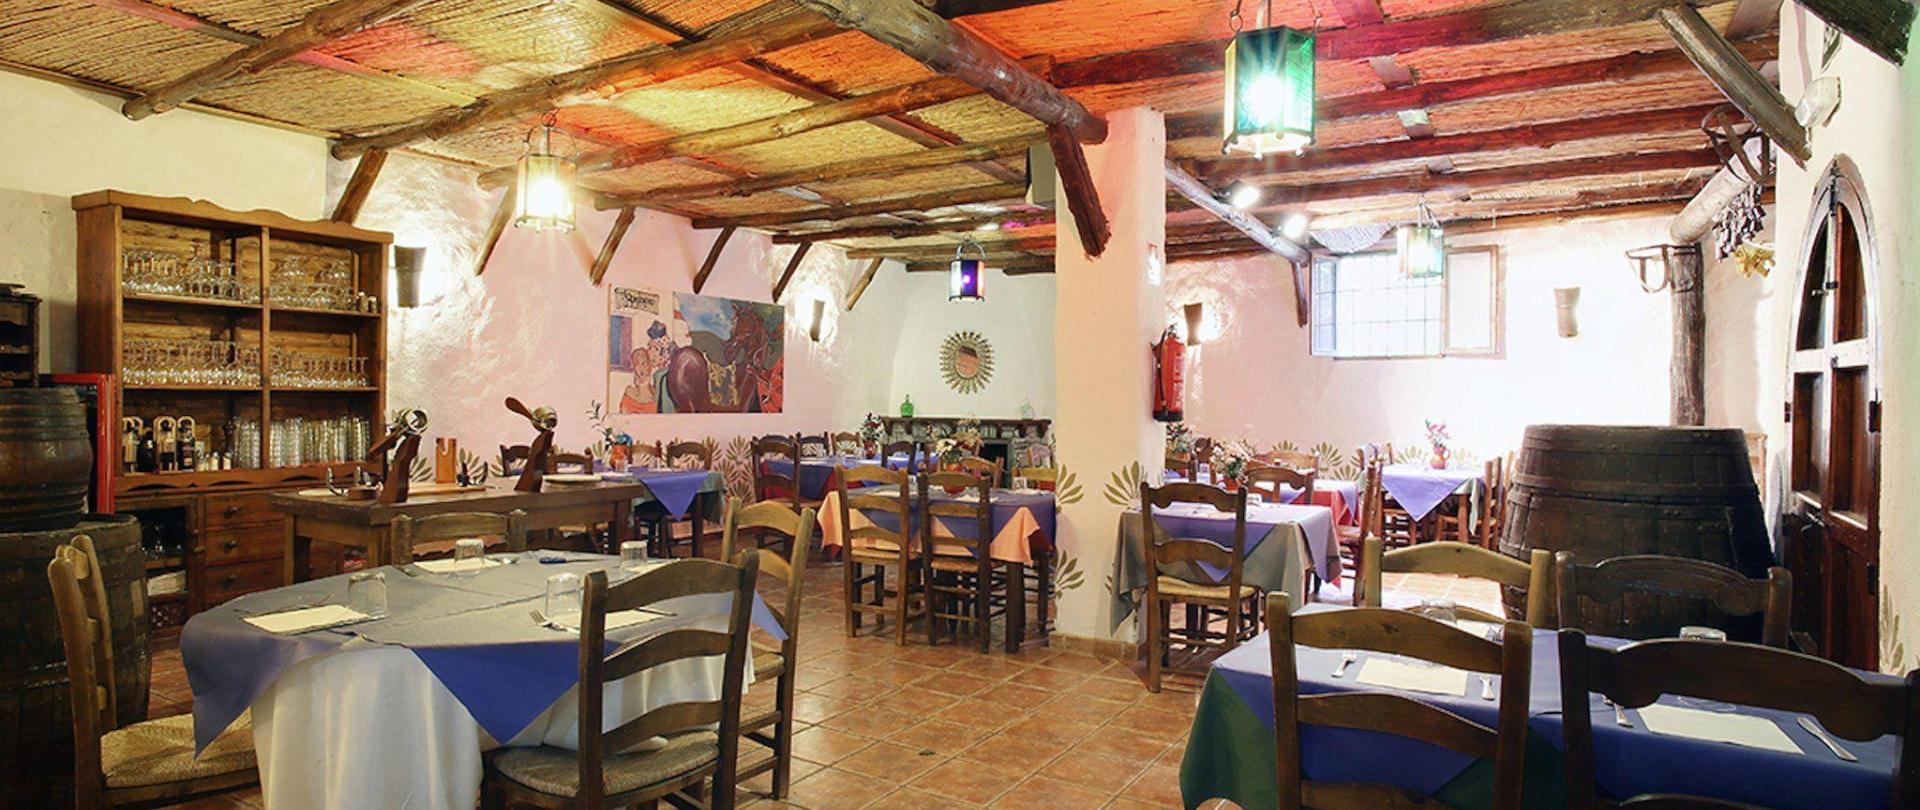 Hotel restaurant:- La Bodega del Bandolero